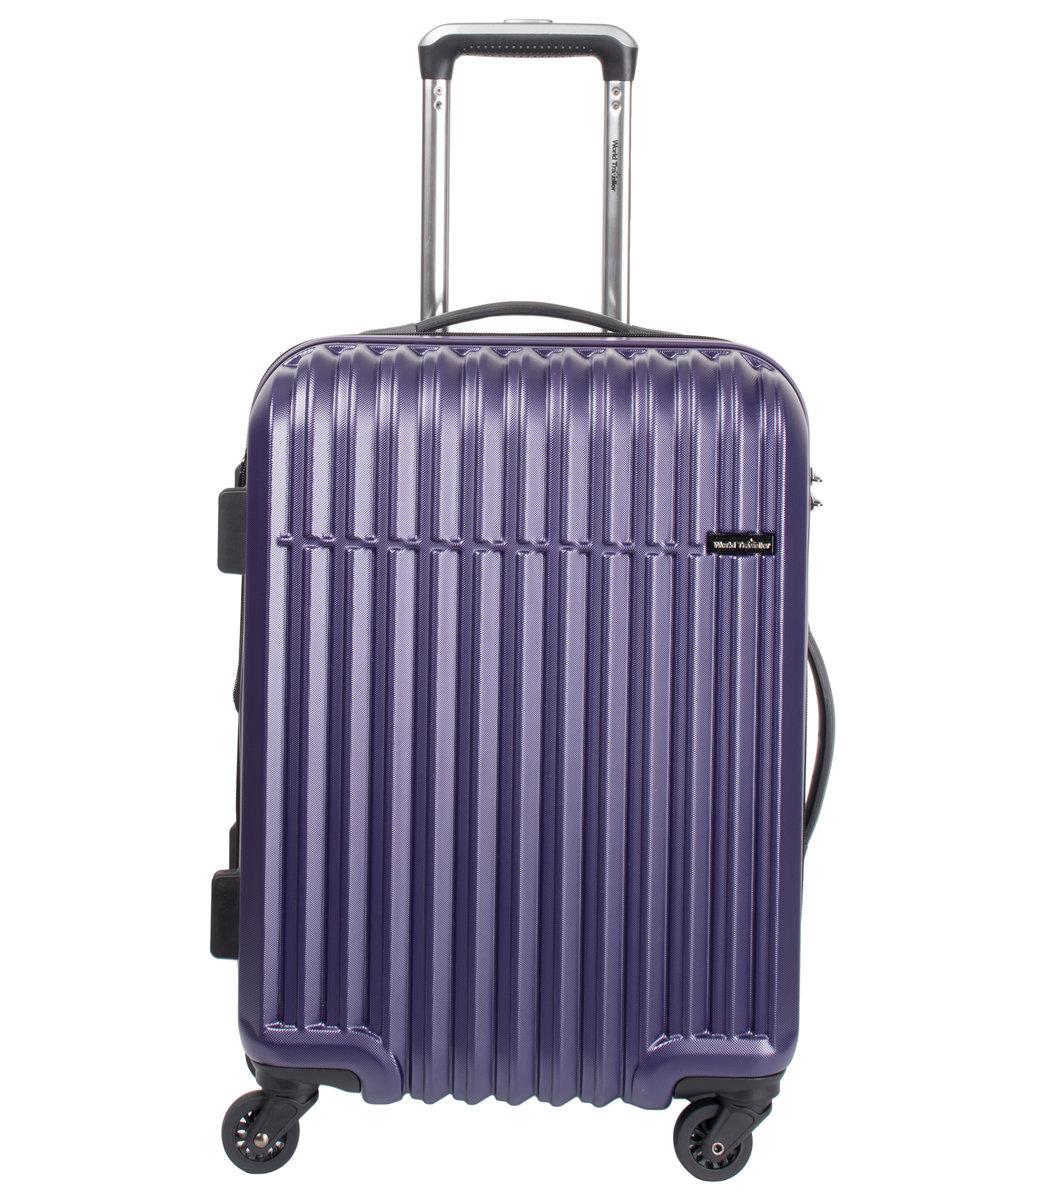 "World Traveller - TAIPEI 24"" (M) - Violet - 17T46103-008"